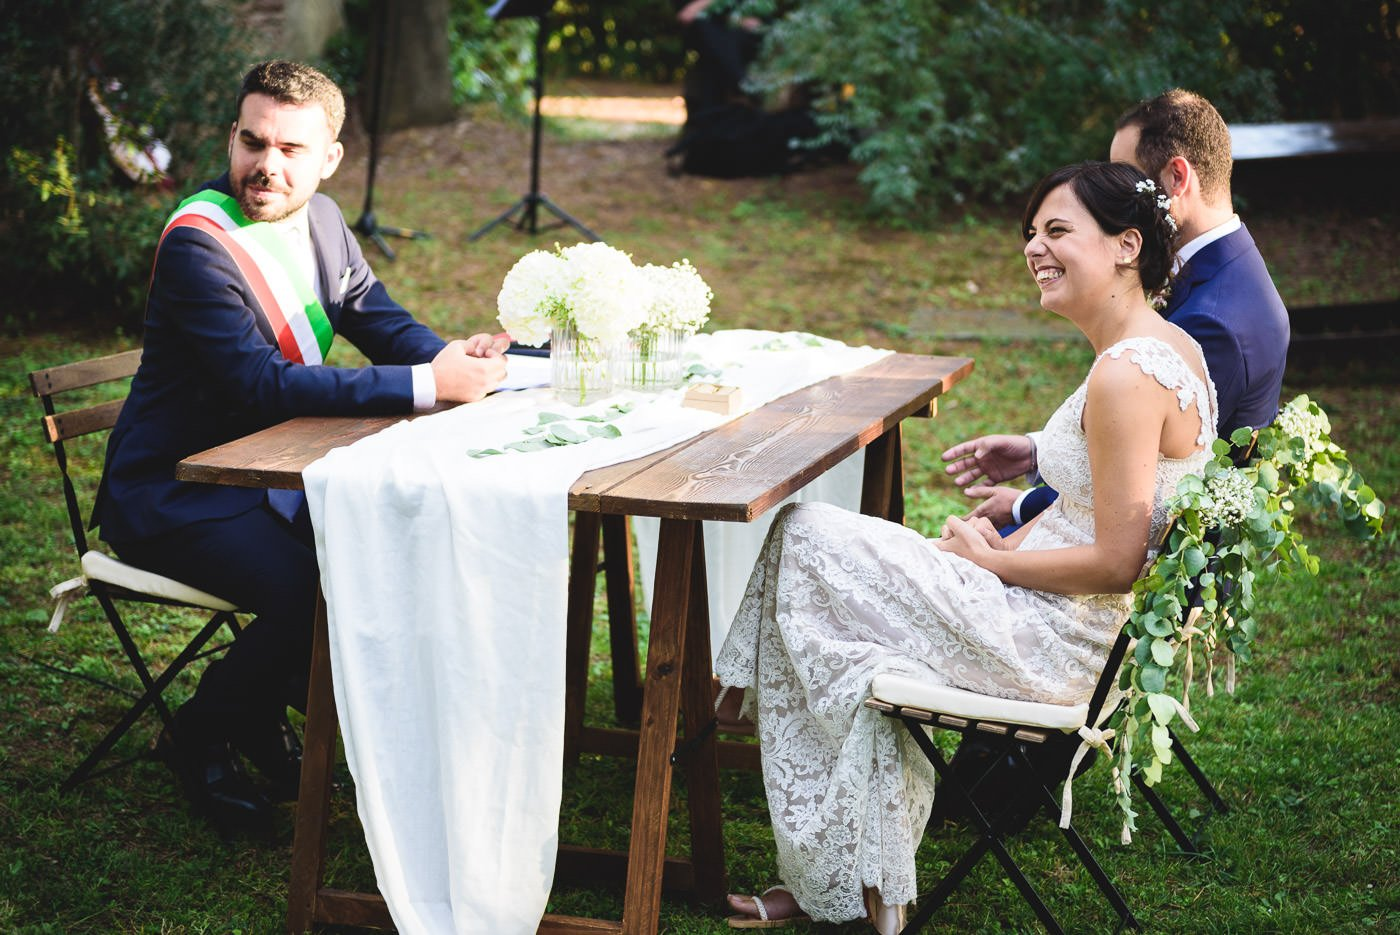 Matrimonio Giulia & Federico 09_15 – Alessio Nobili Photographer-29